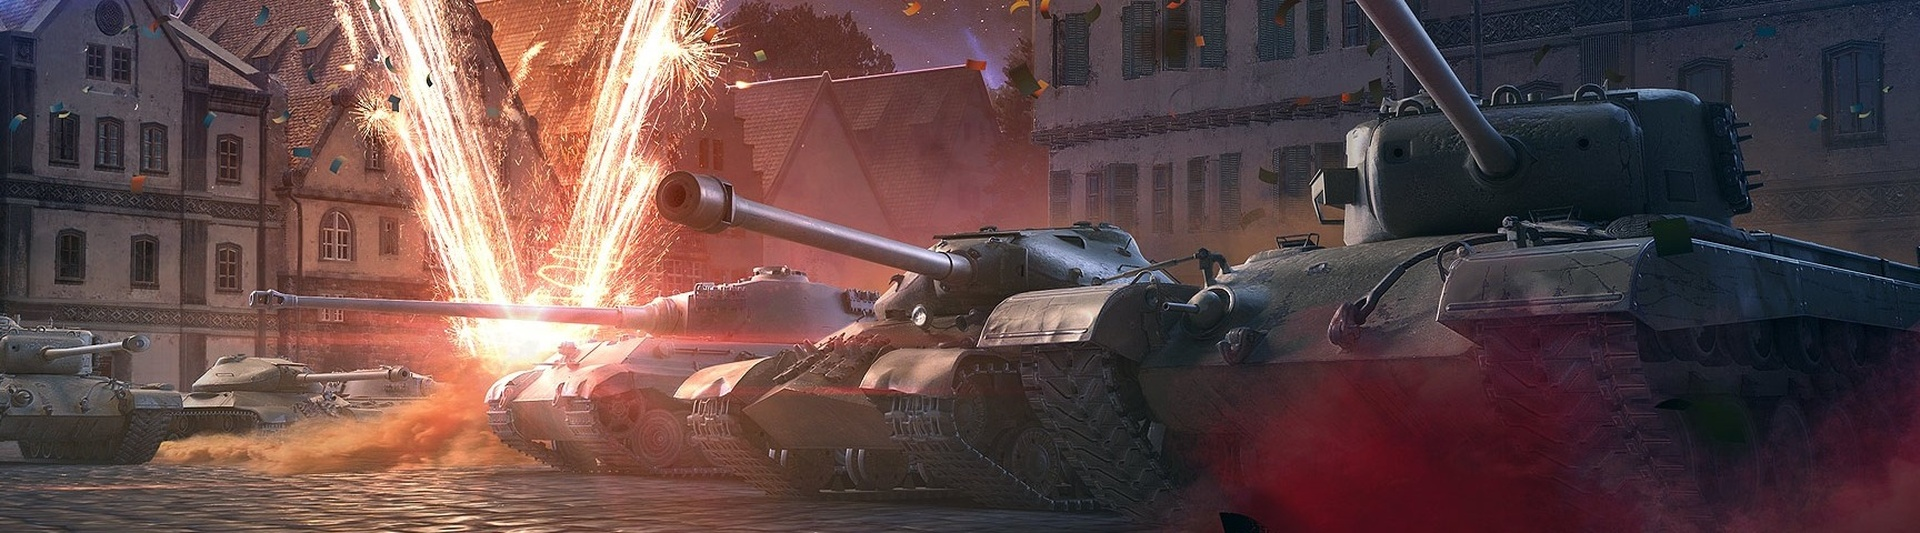 World Of Tanks Blitz Wargaming S Premier Mobile Title Has